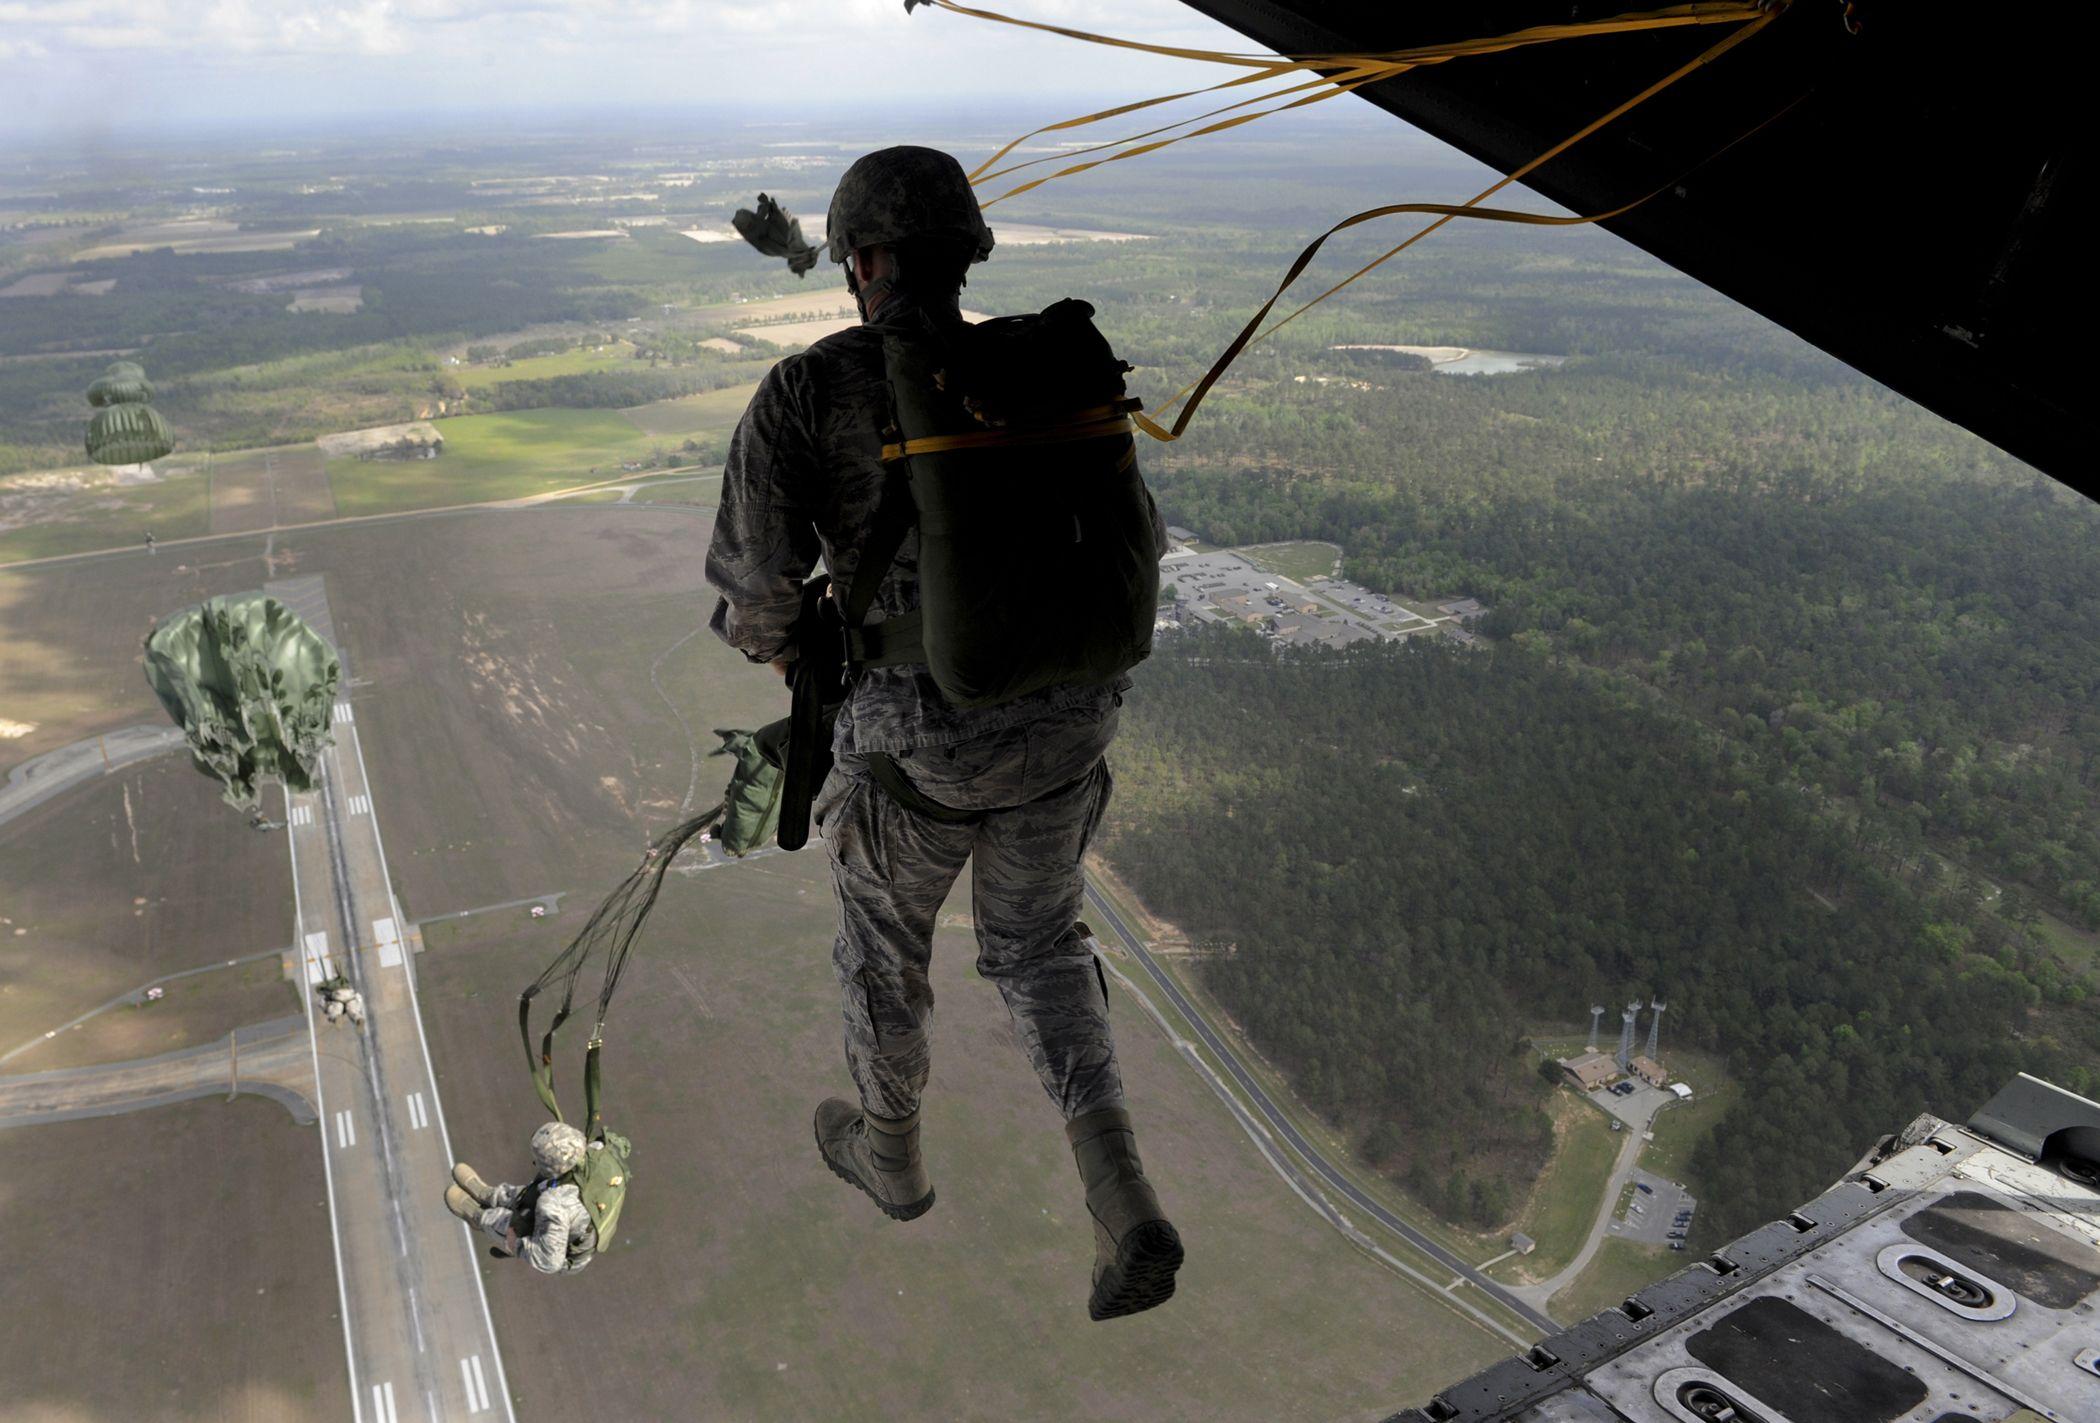 Walking On Air Airborne ranger, Airborne army, Military